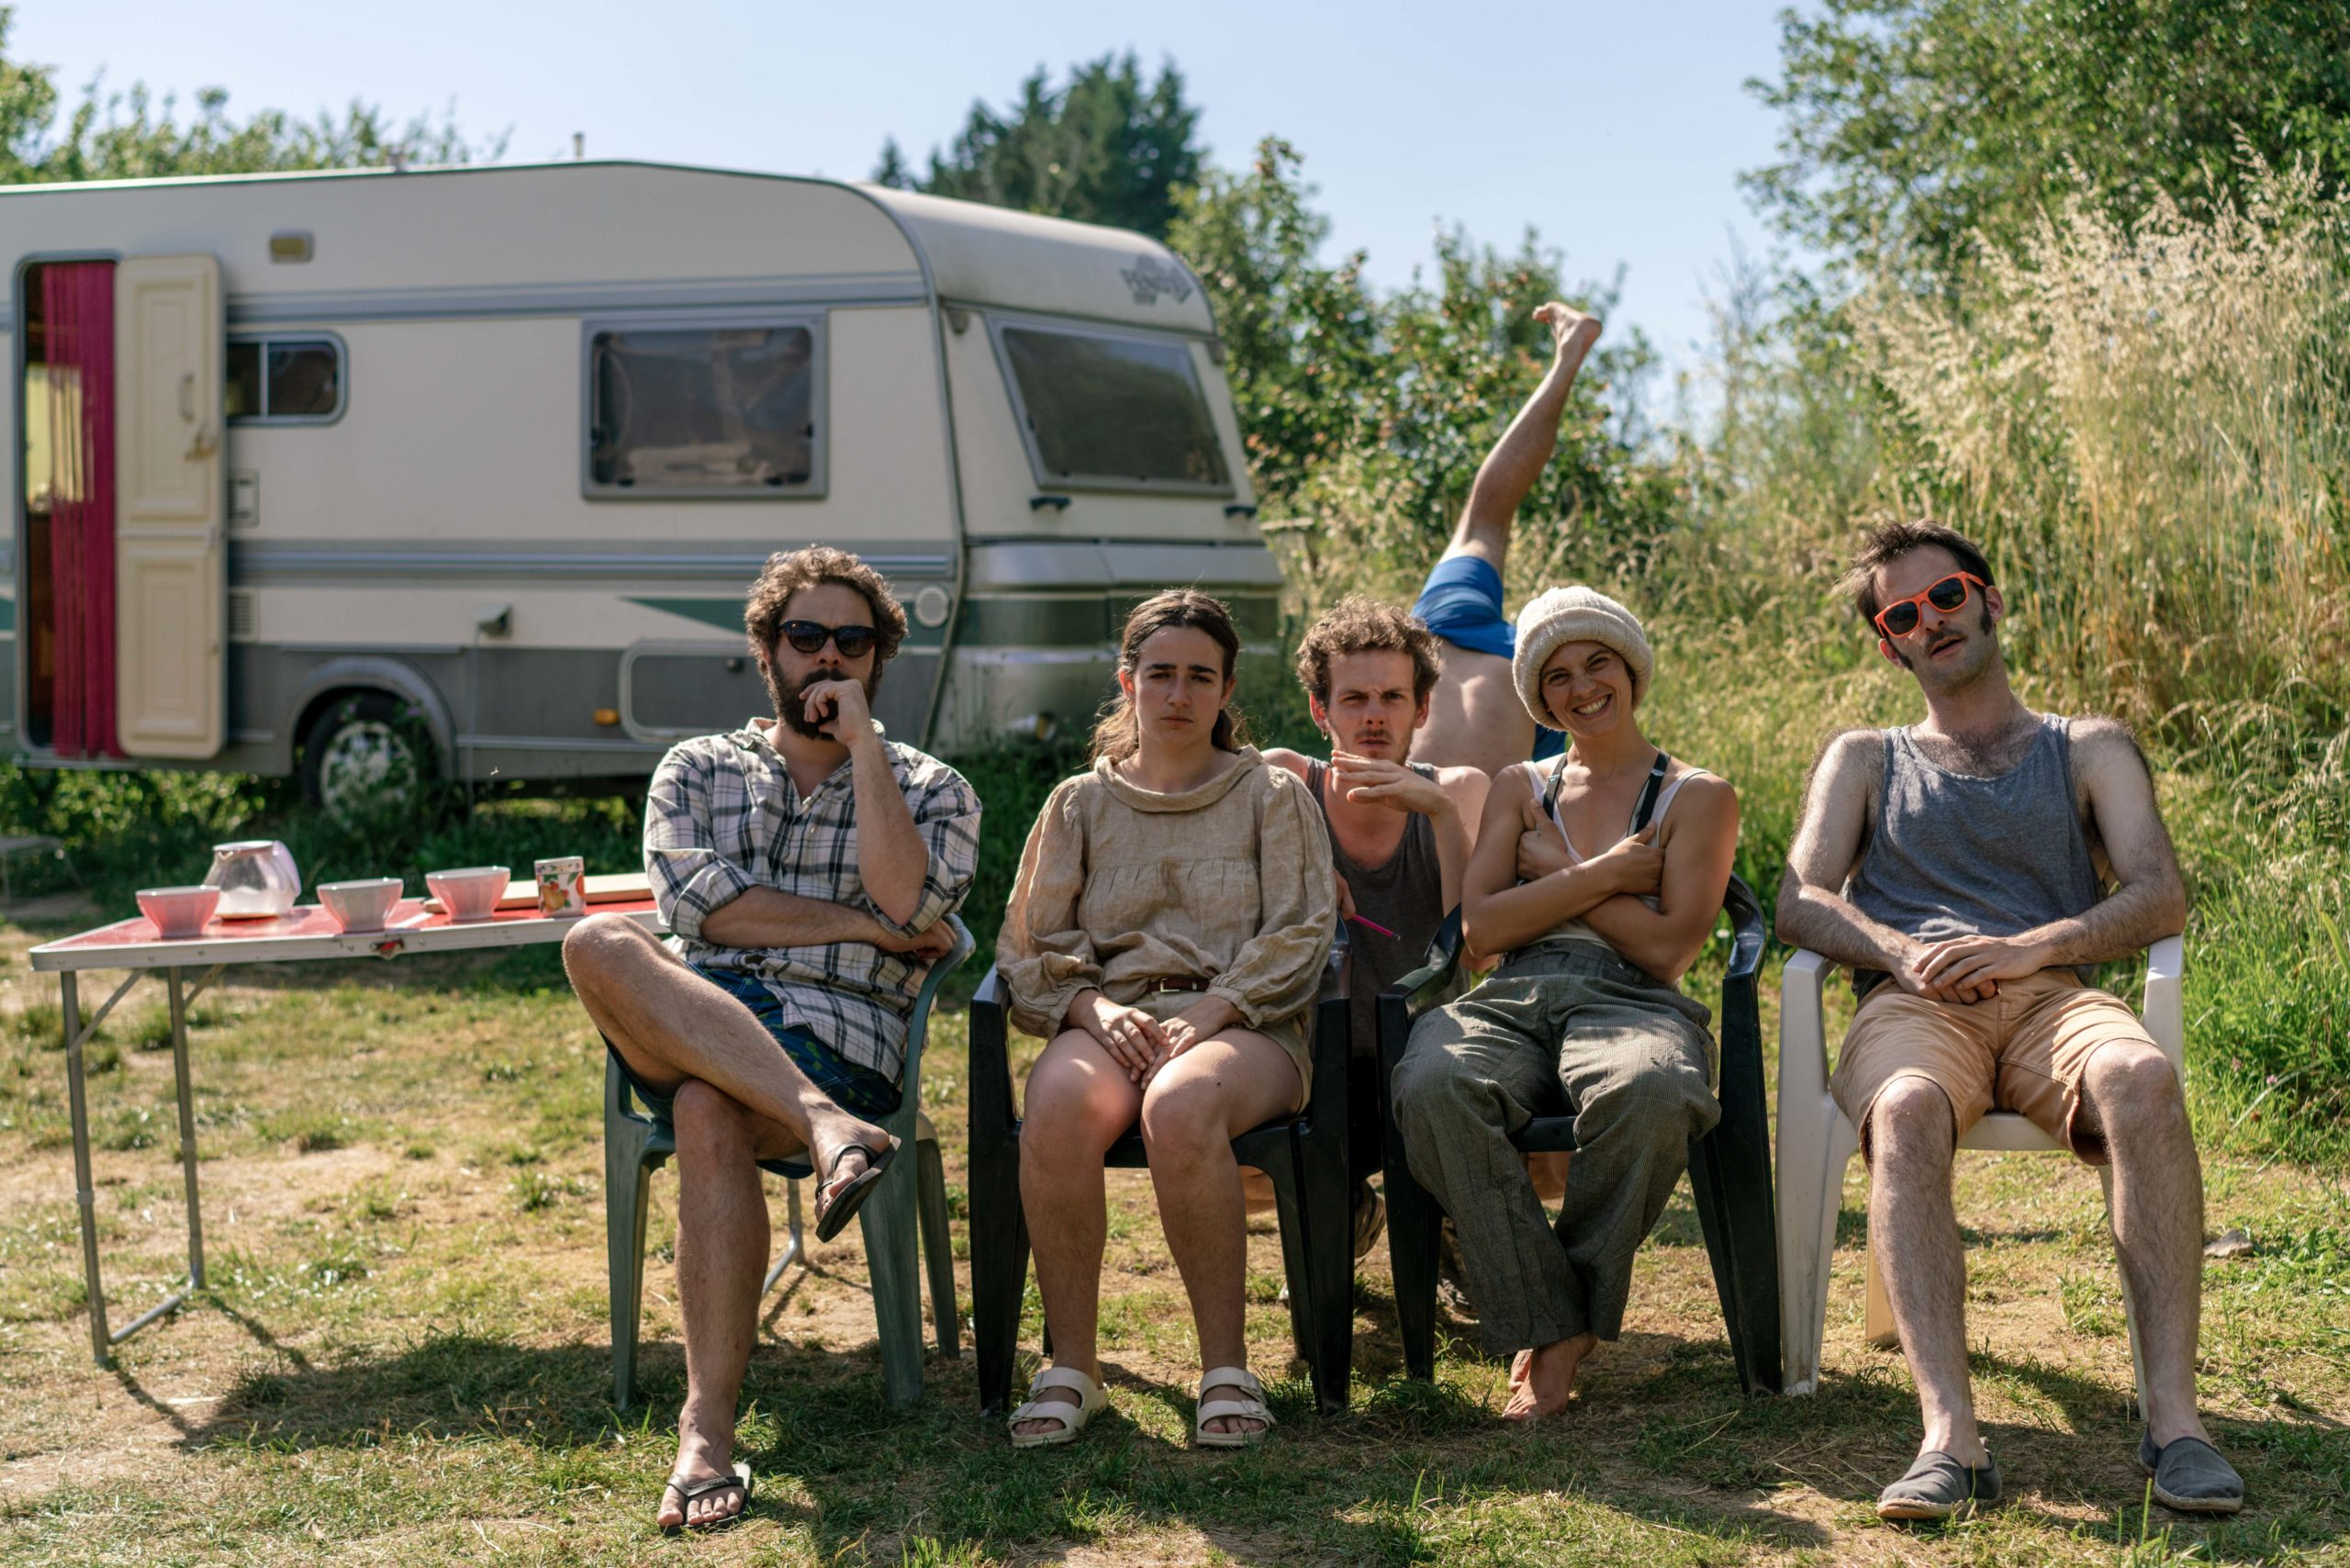 Collectif Greta Koetz, Nicolas Payet, Marie Alié, Sami Dubot, Léa Romagny et Antoine Herbulot. Photo prise par Thomas Dubot en juin 2020 à Salayrac.